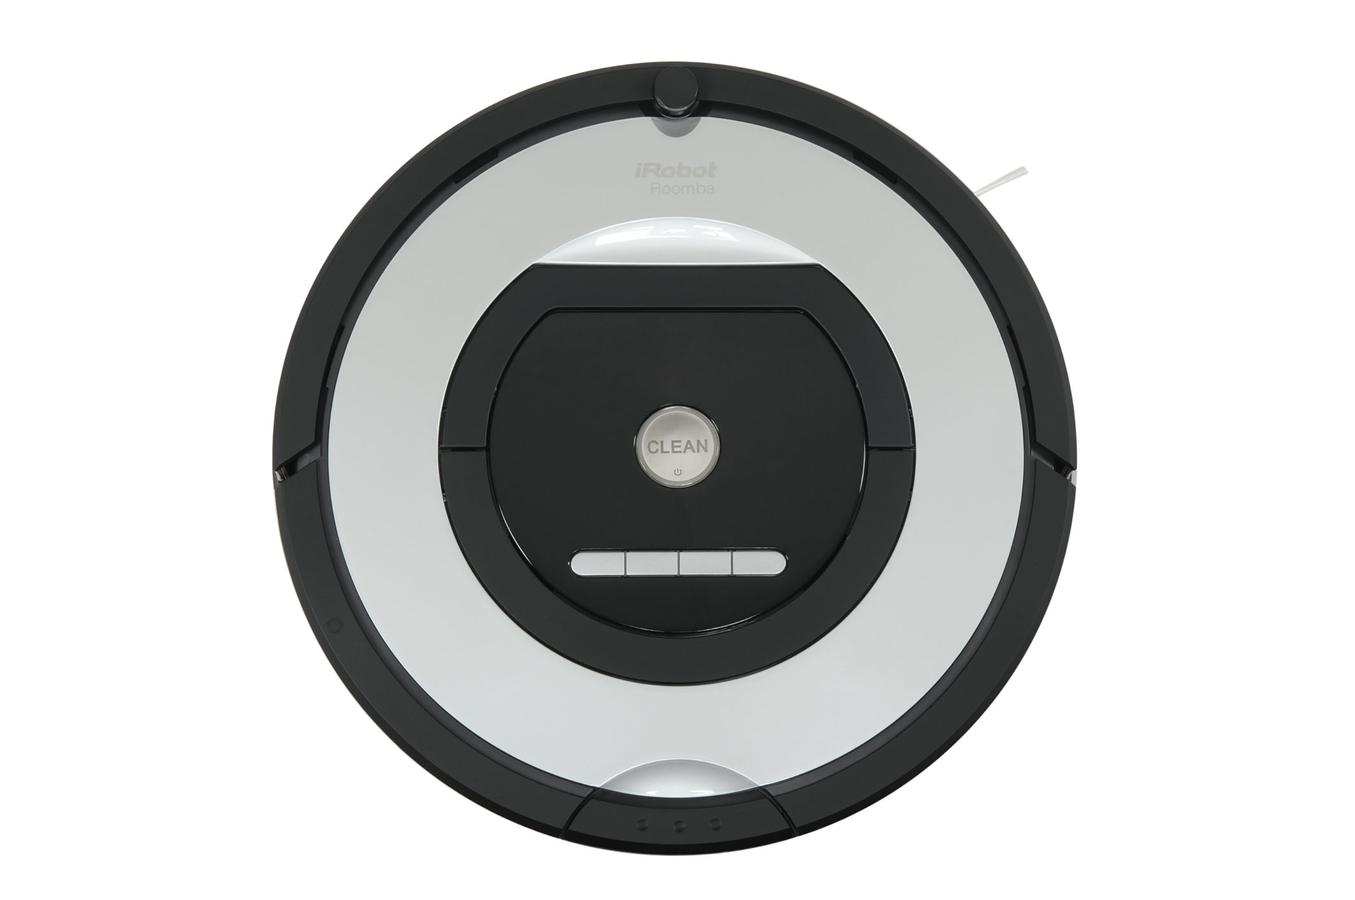 aspirateur robot irobot roomba 775 pet roomba 3640086 darty. Black Bedroom Furniture Sets. Home Design Ideas